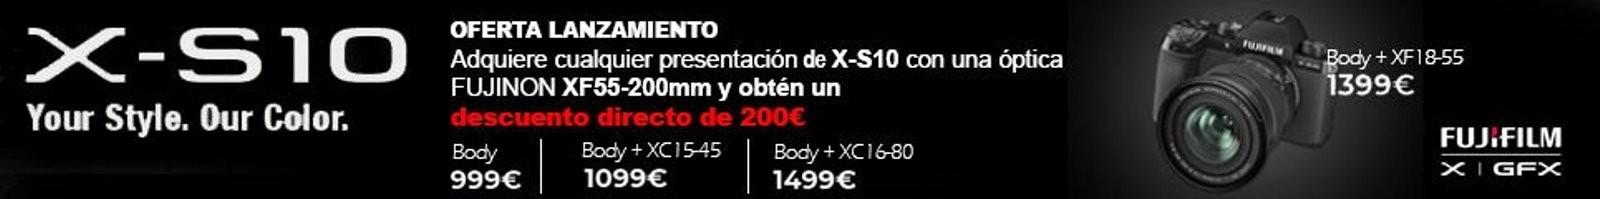 fujix-s10 promo